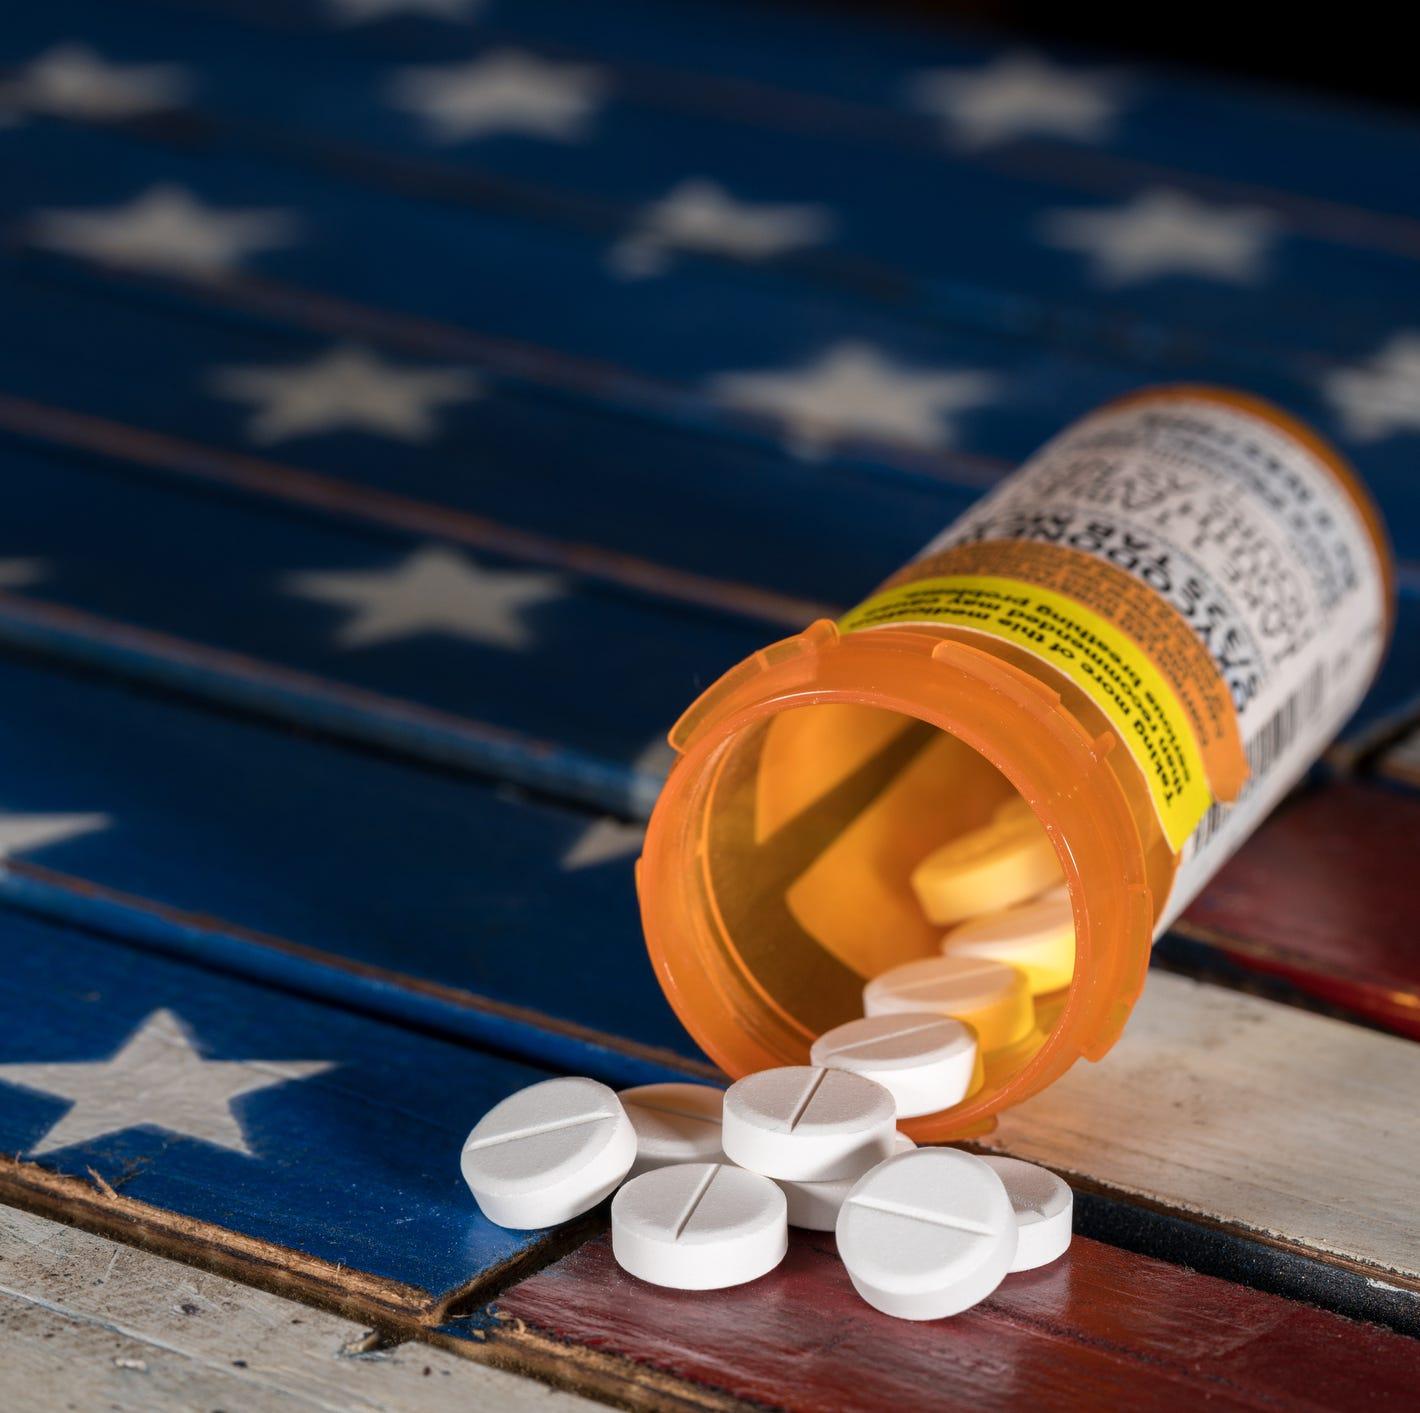 Accomack files $40 million lawsuit against opioid companies